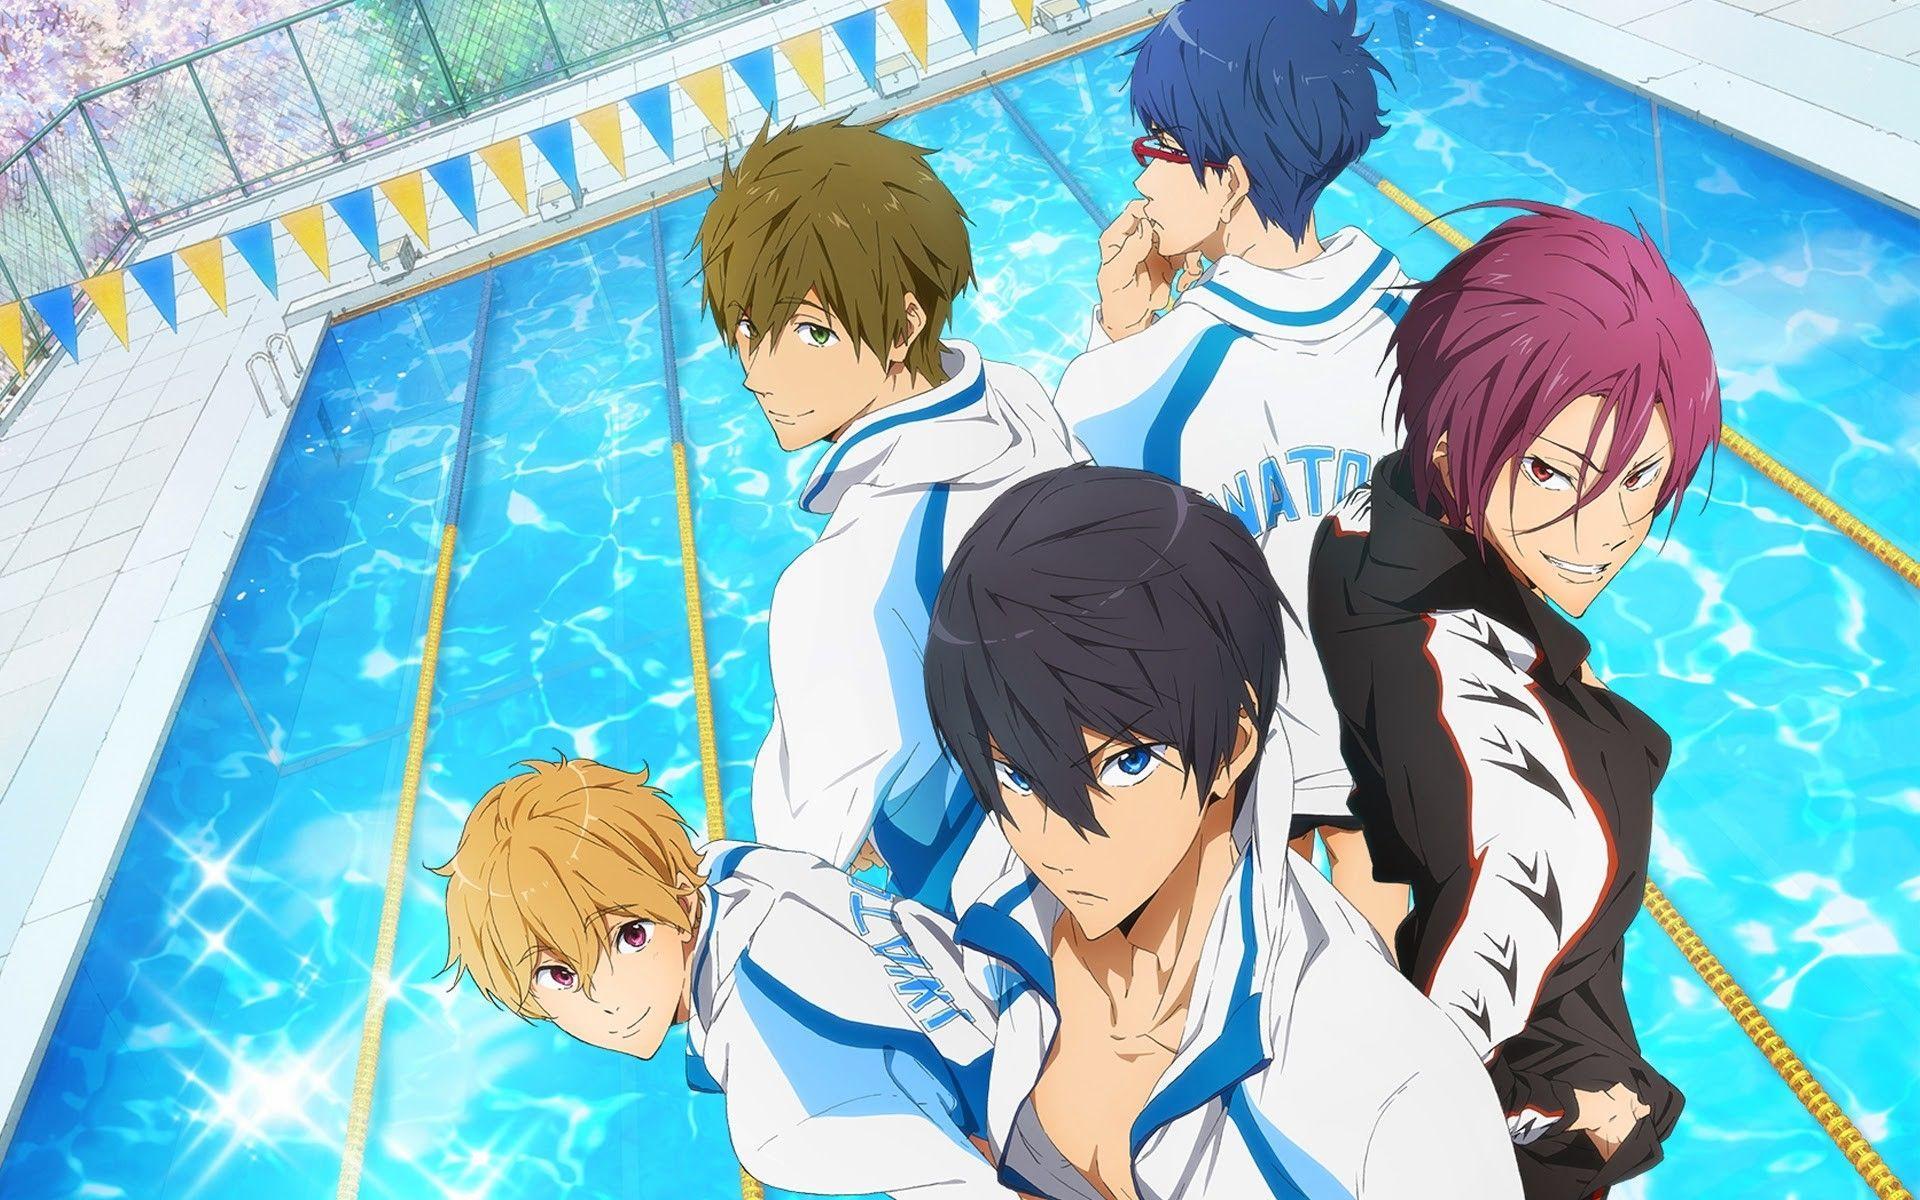 Free Iwatobi Swim Club Wallpaper